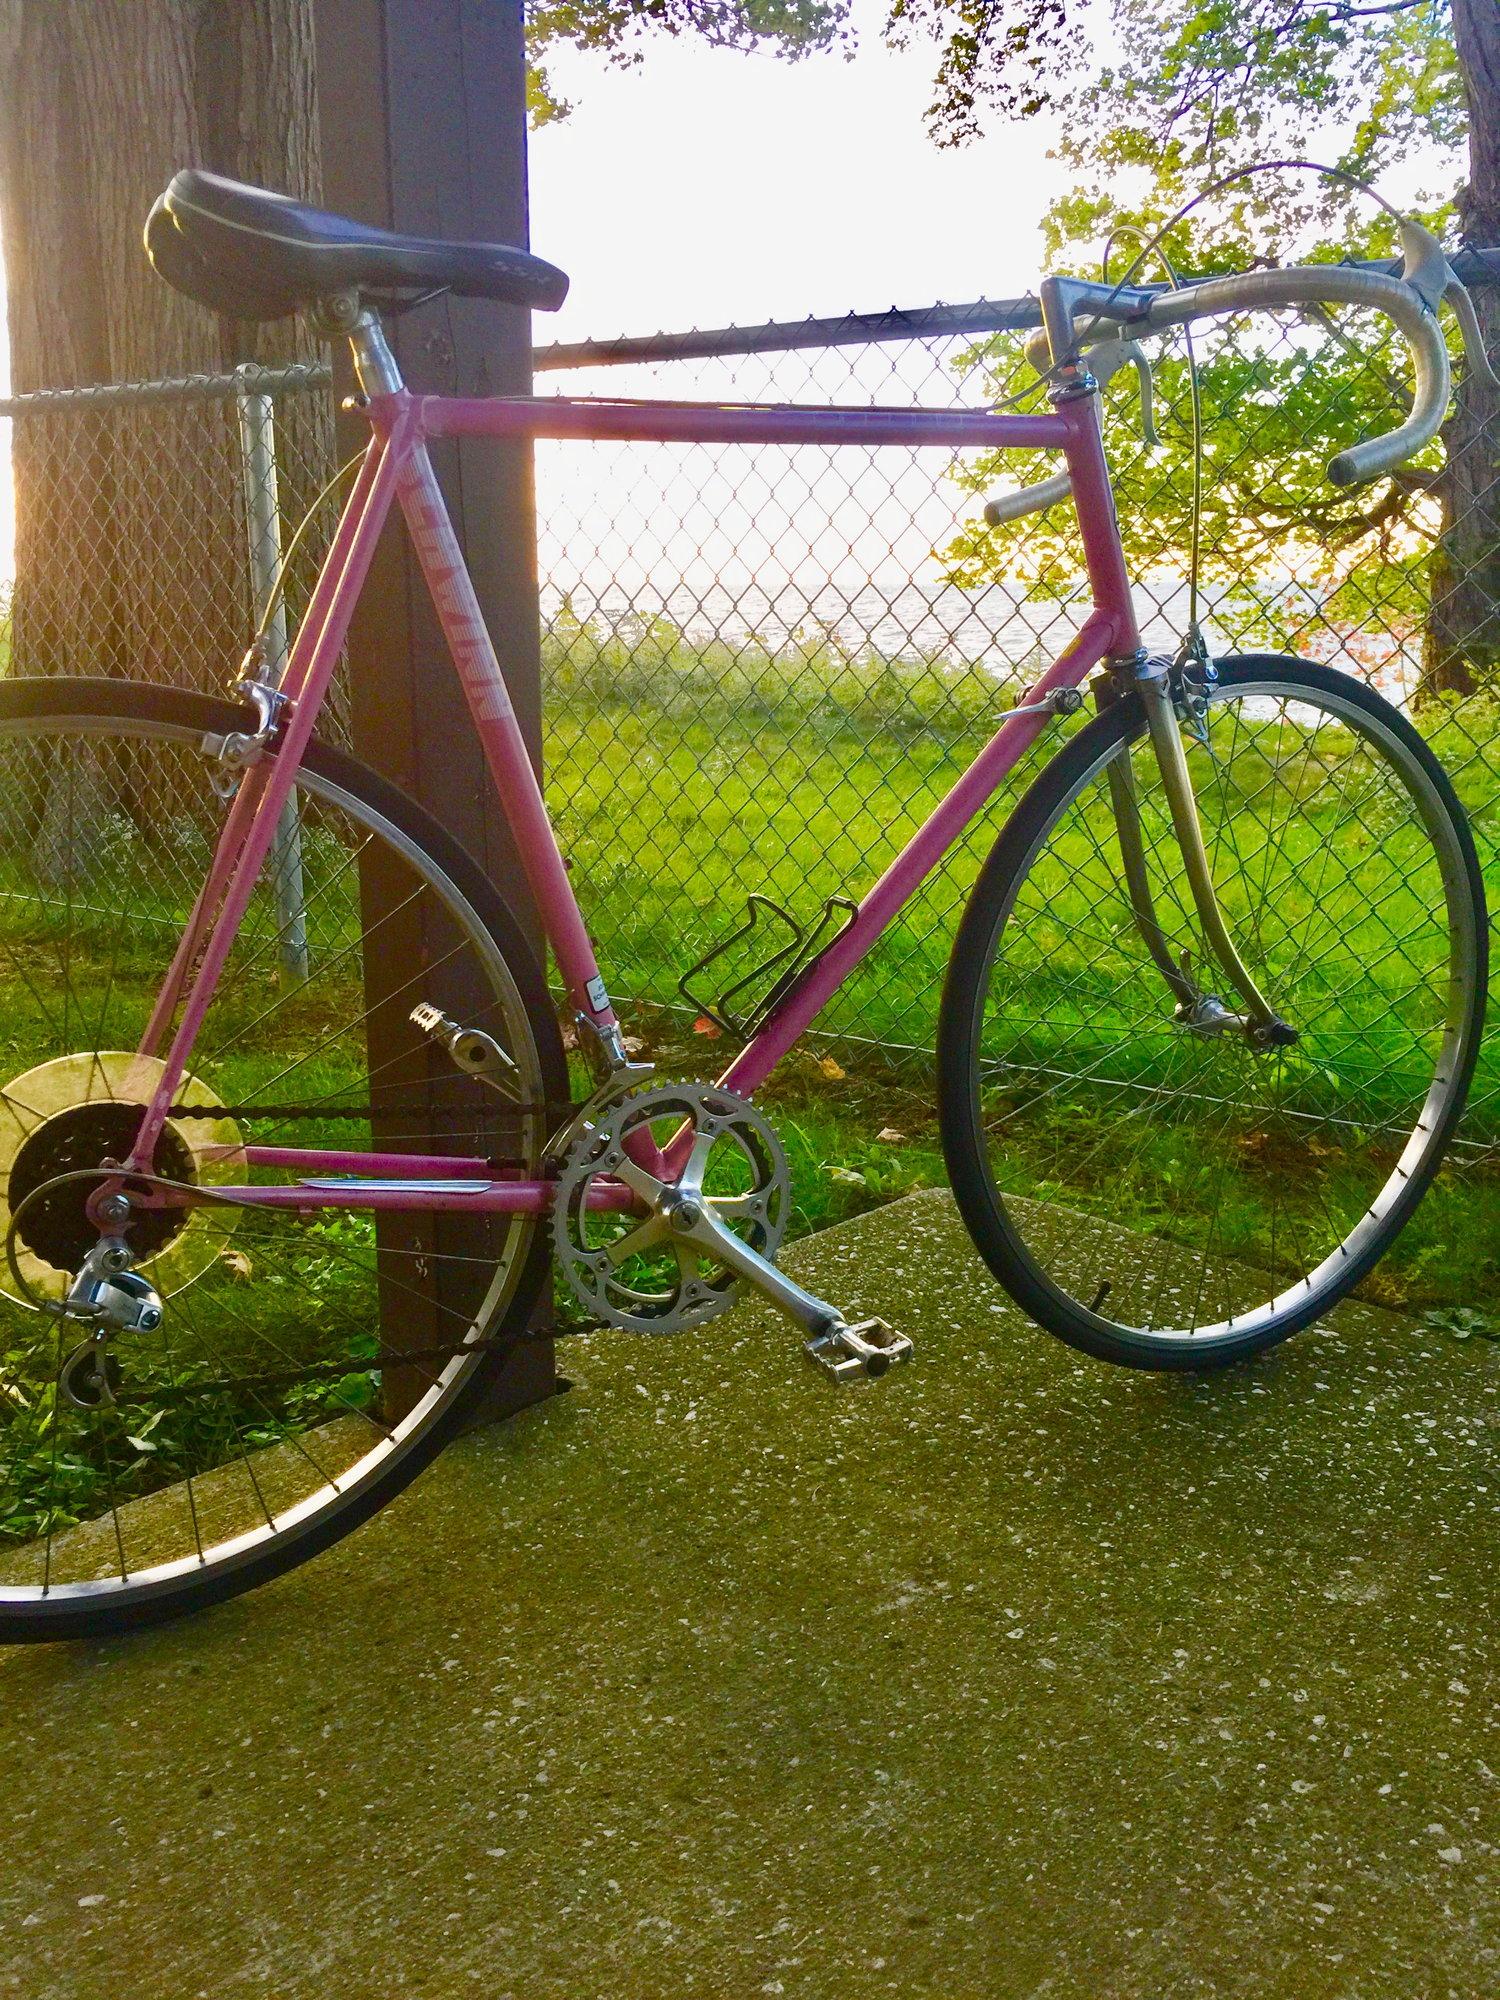 Schwinn Prelude  What have I got here? - Bike Forums